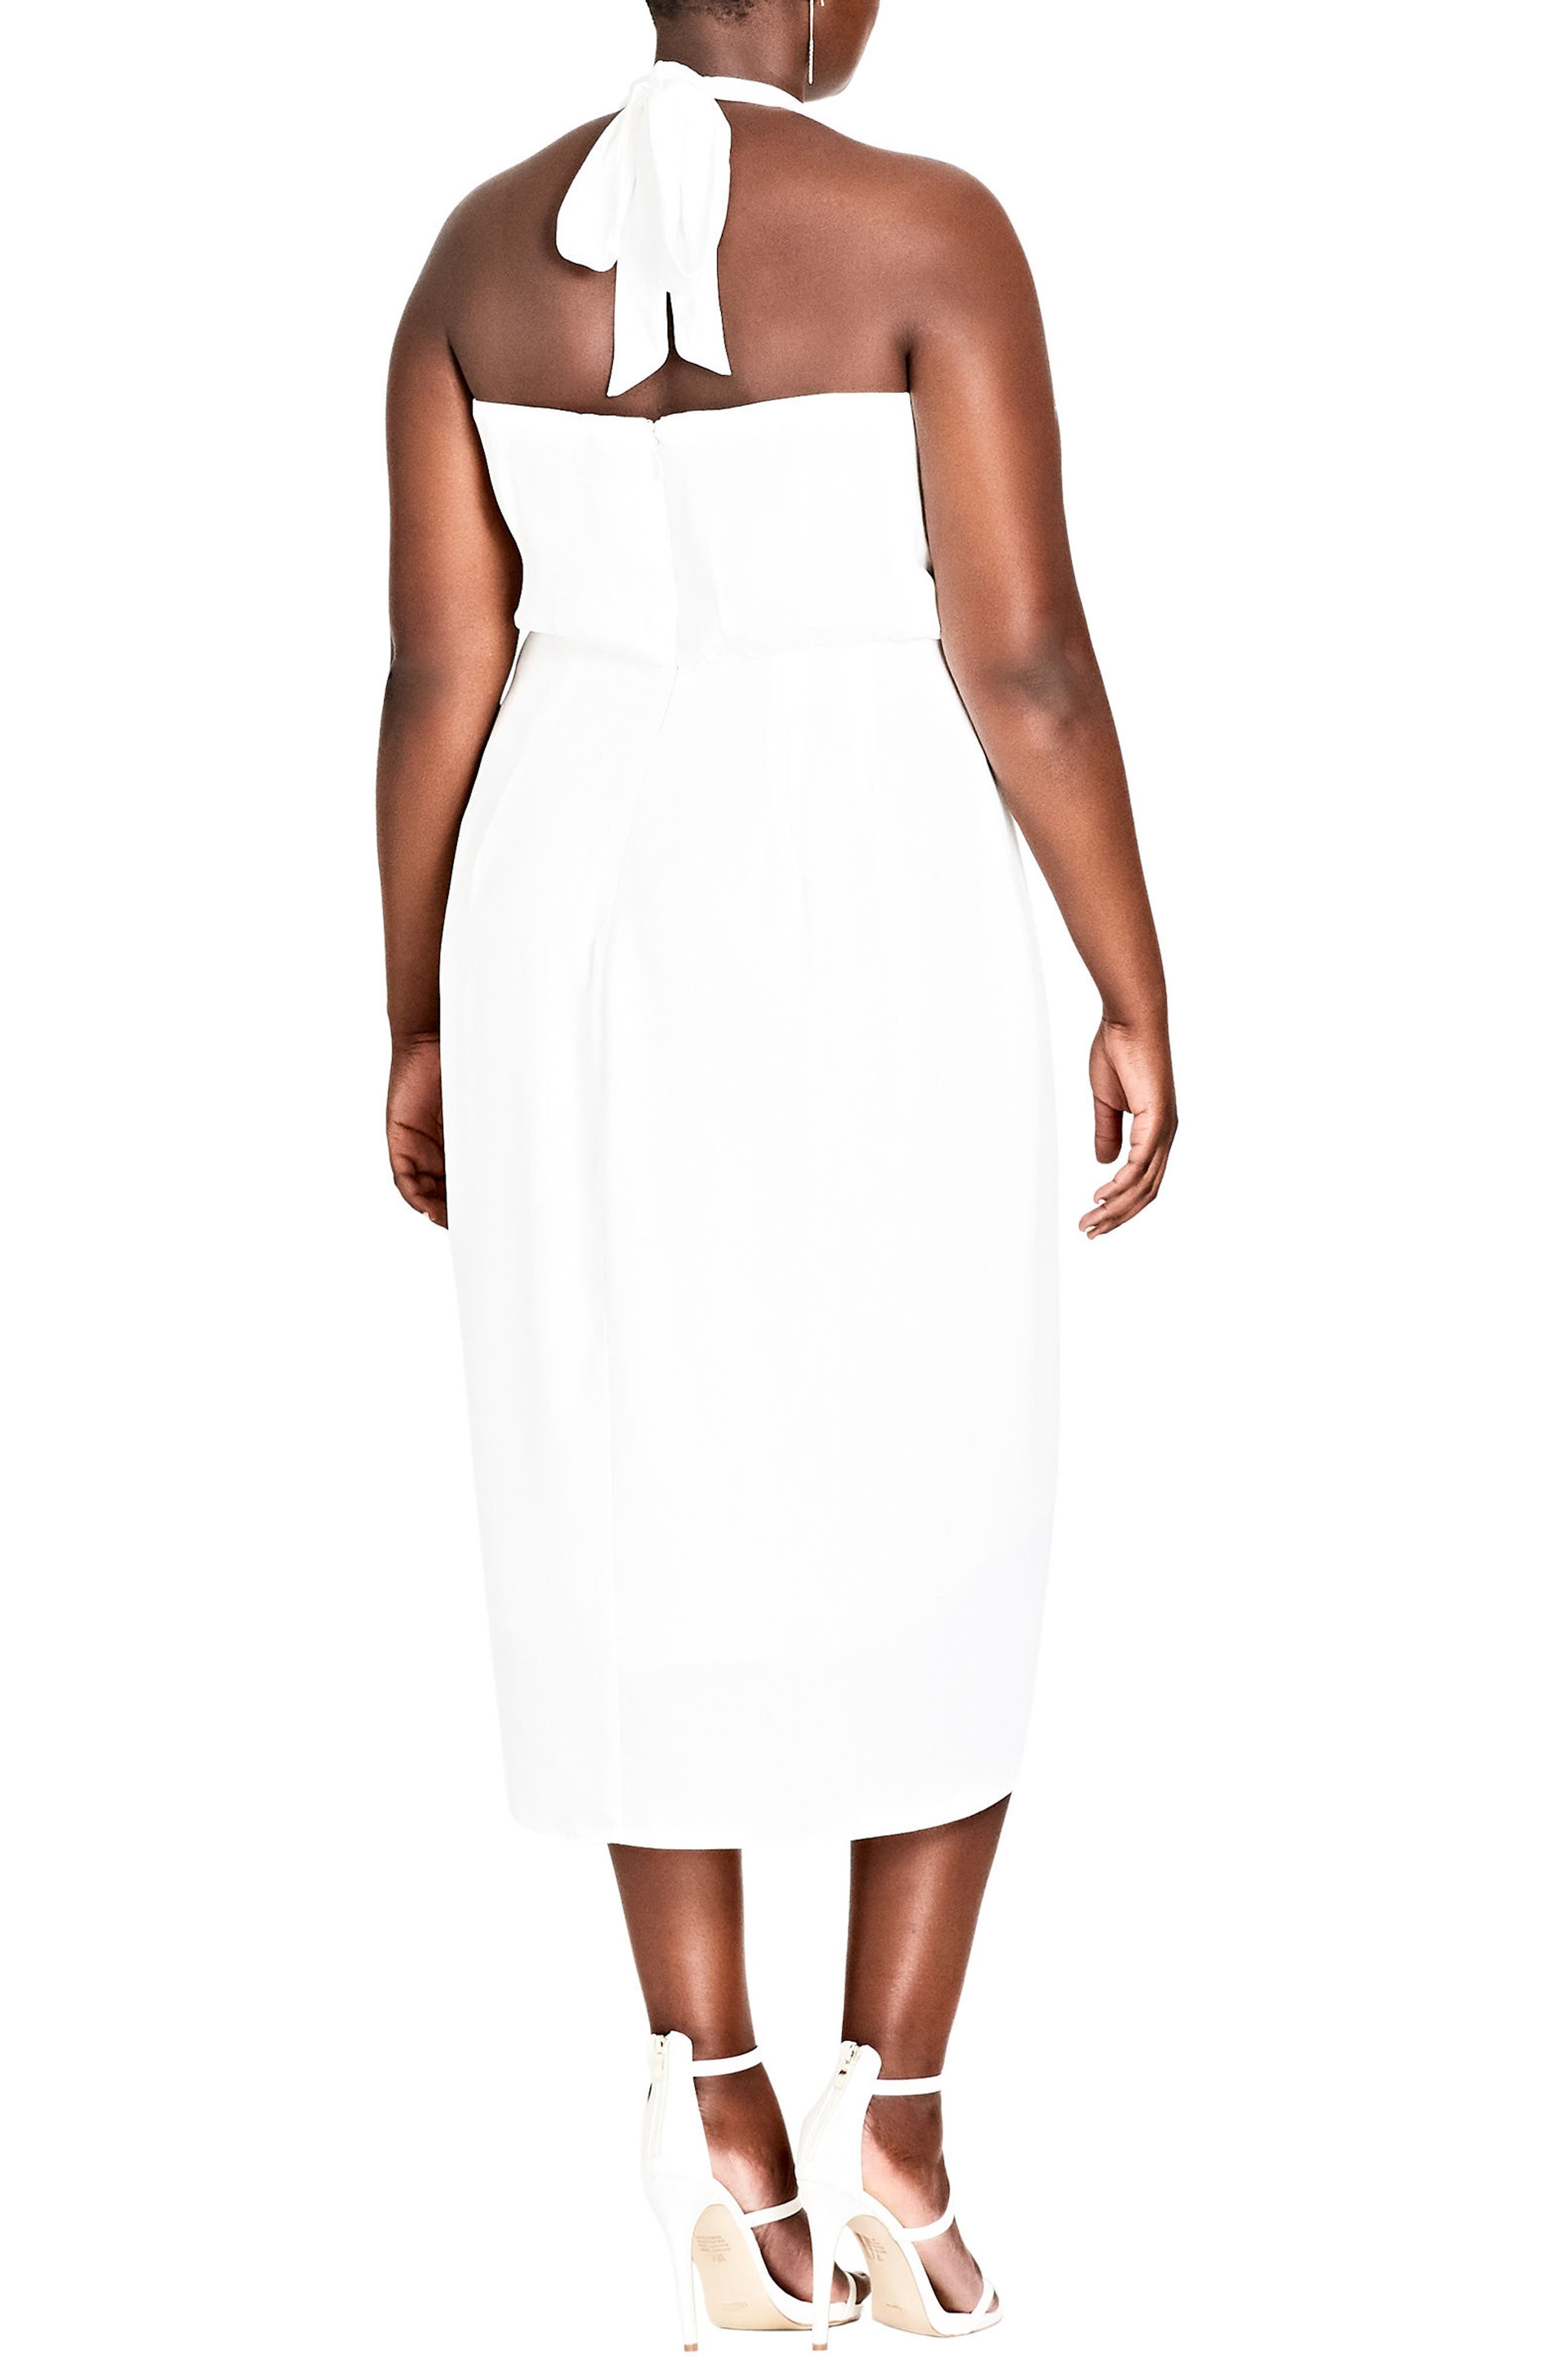 Romance Blouson Halter Dress,                             Alternate thumbnail 2, color,                             Ivory